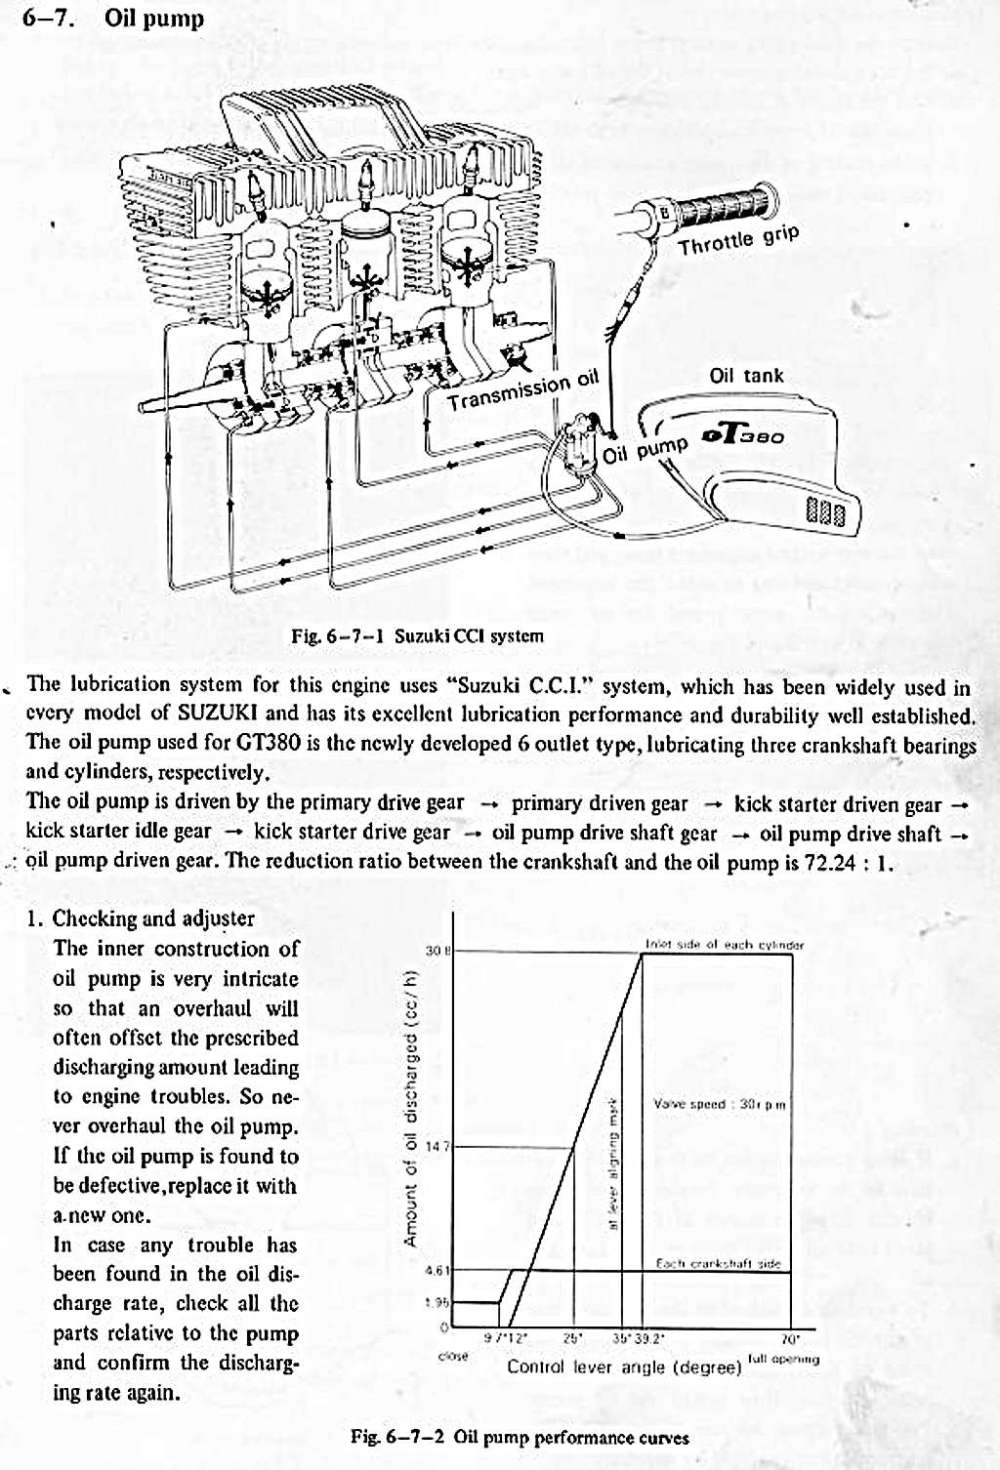 medium resolution of troubleshooting engine gt380 service manual troubleshooting engine suzuki gt380 wiring diagram